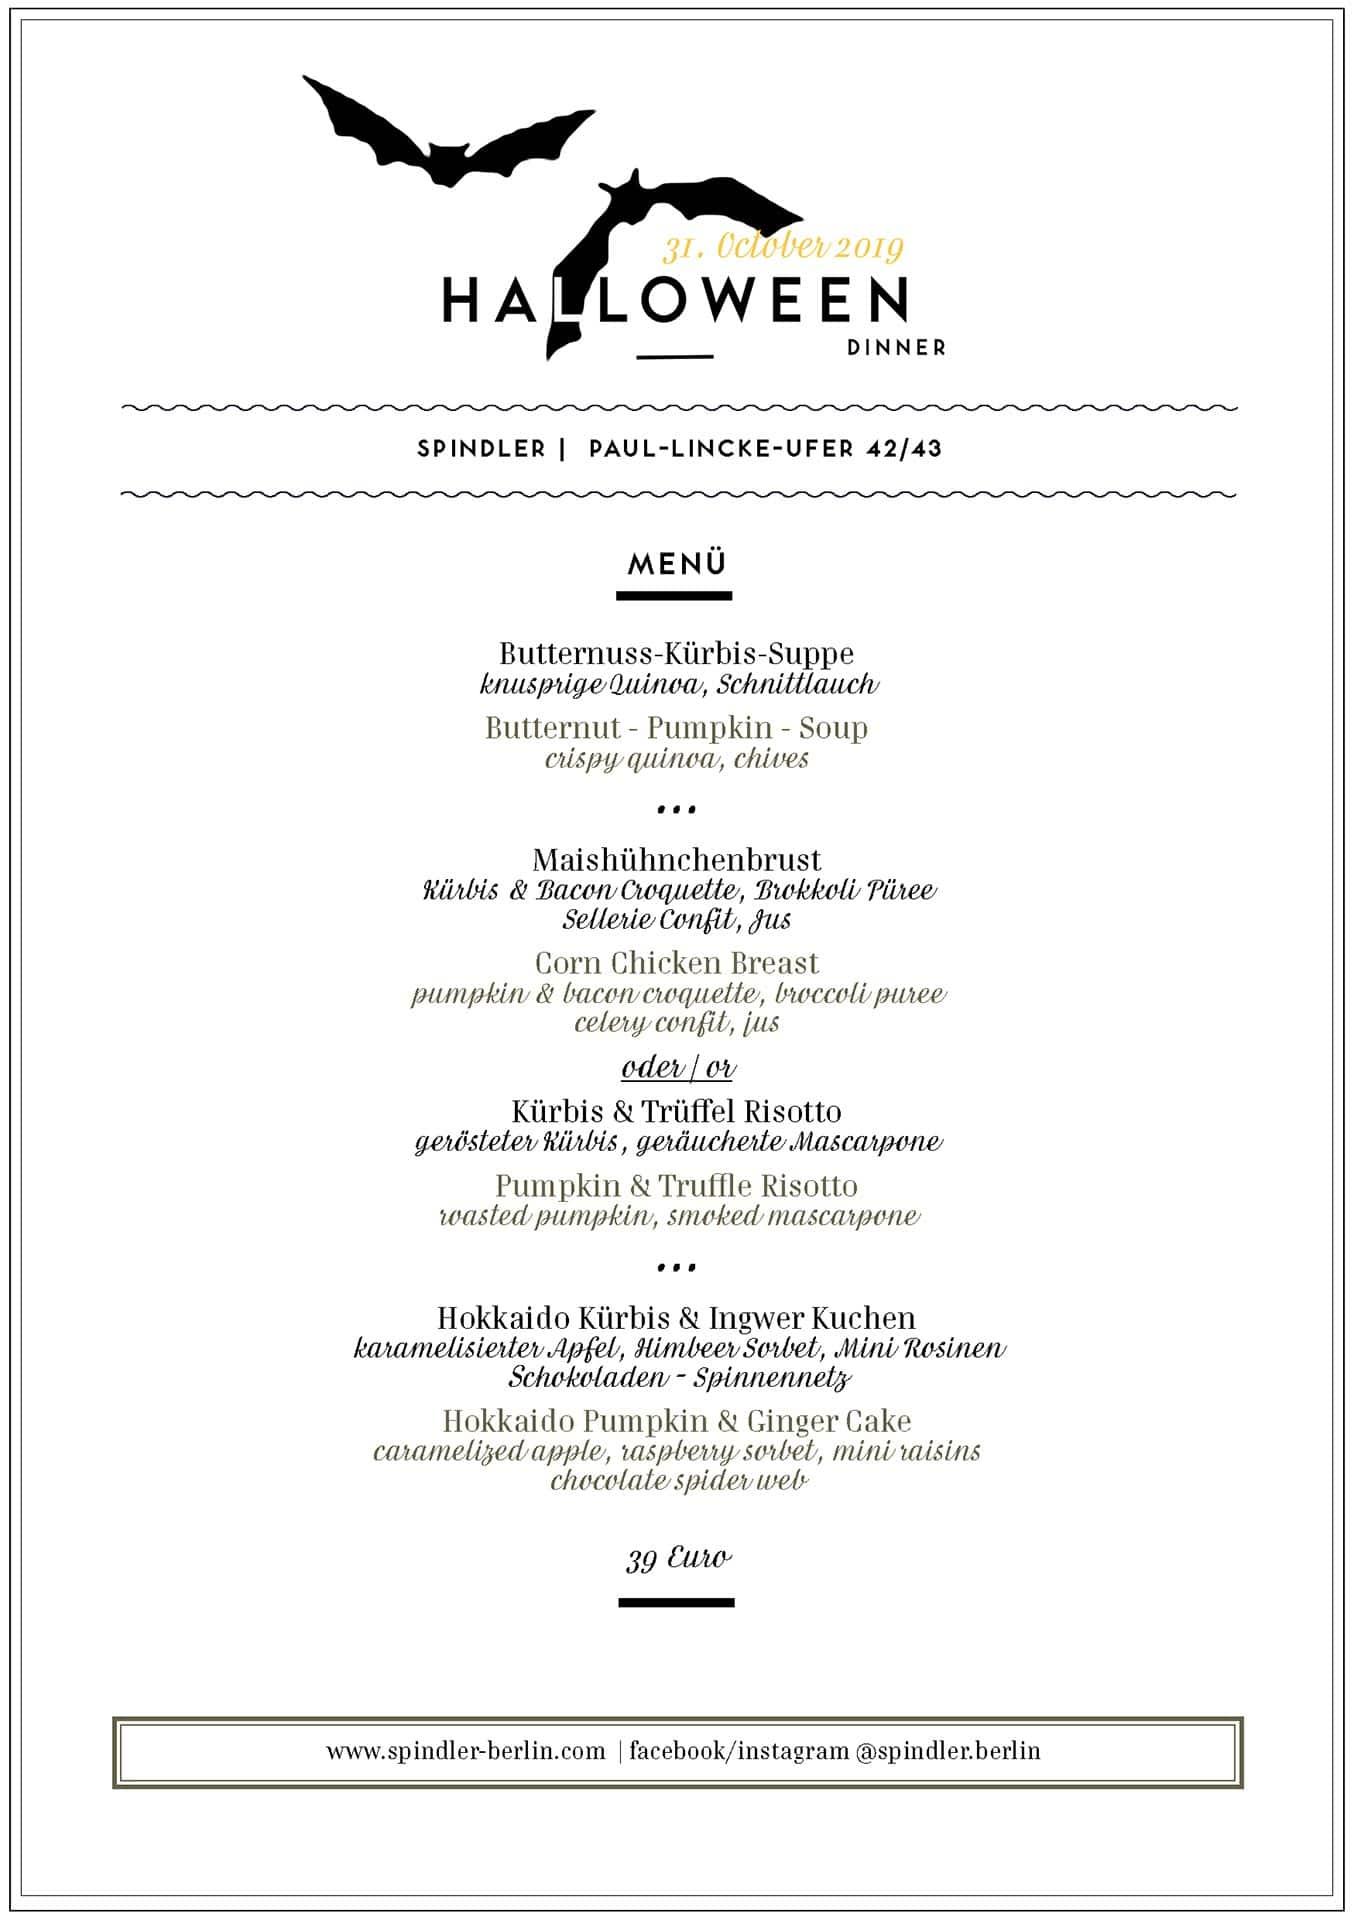 Spindler Halloween Dinner Berlin Menü